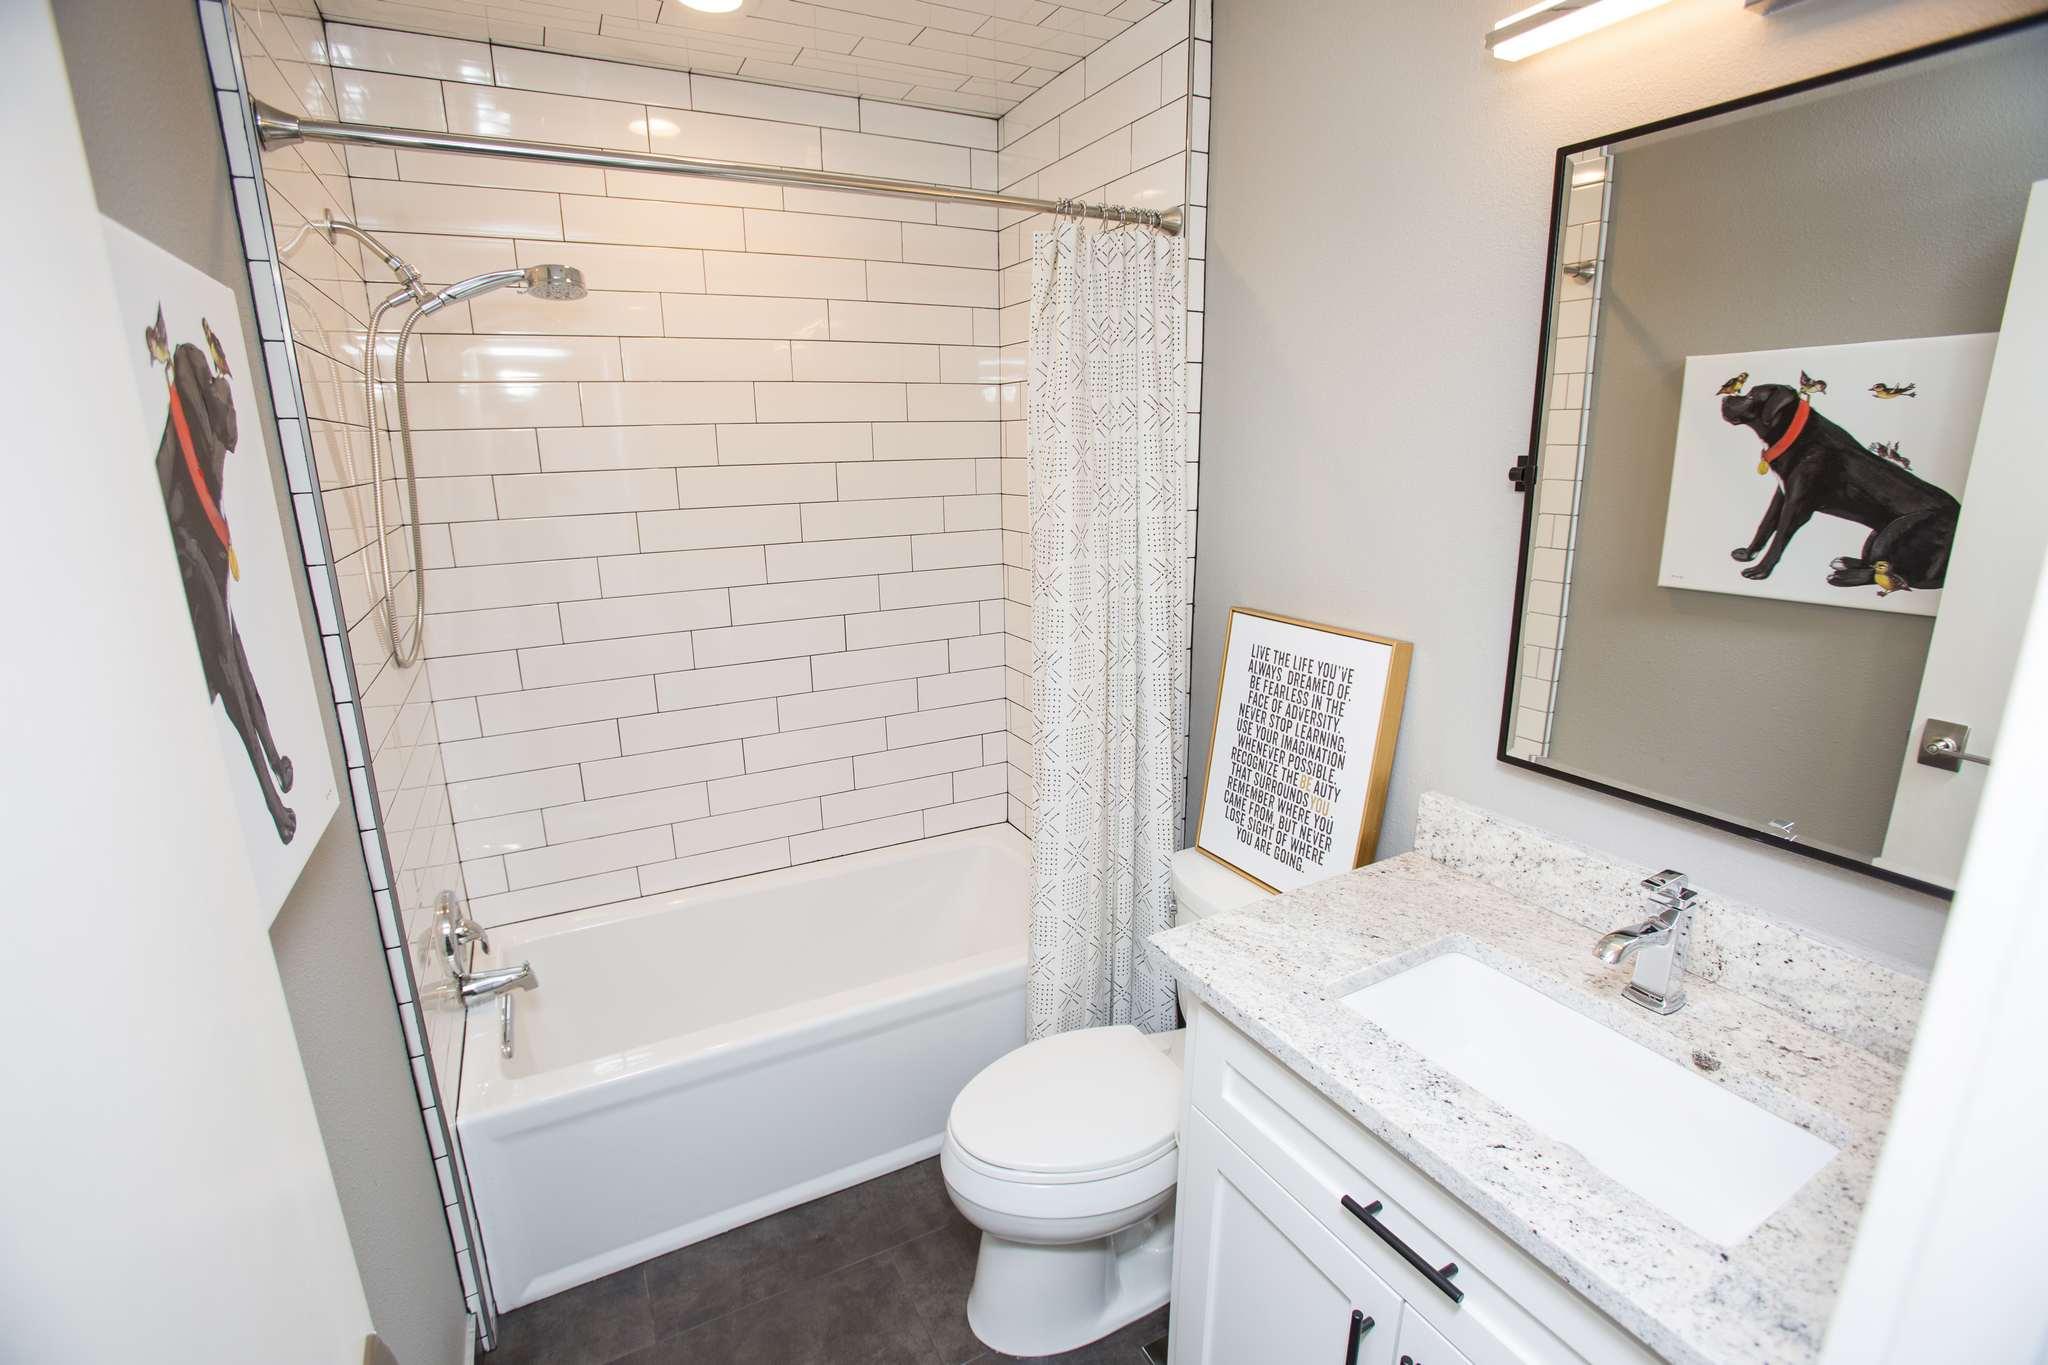 Two Bathroom Reconfiguration: Master Bath Gets a Shower